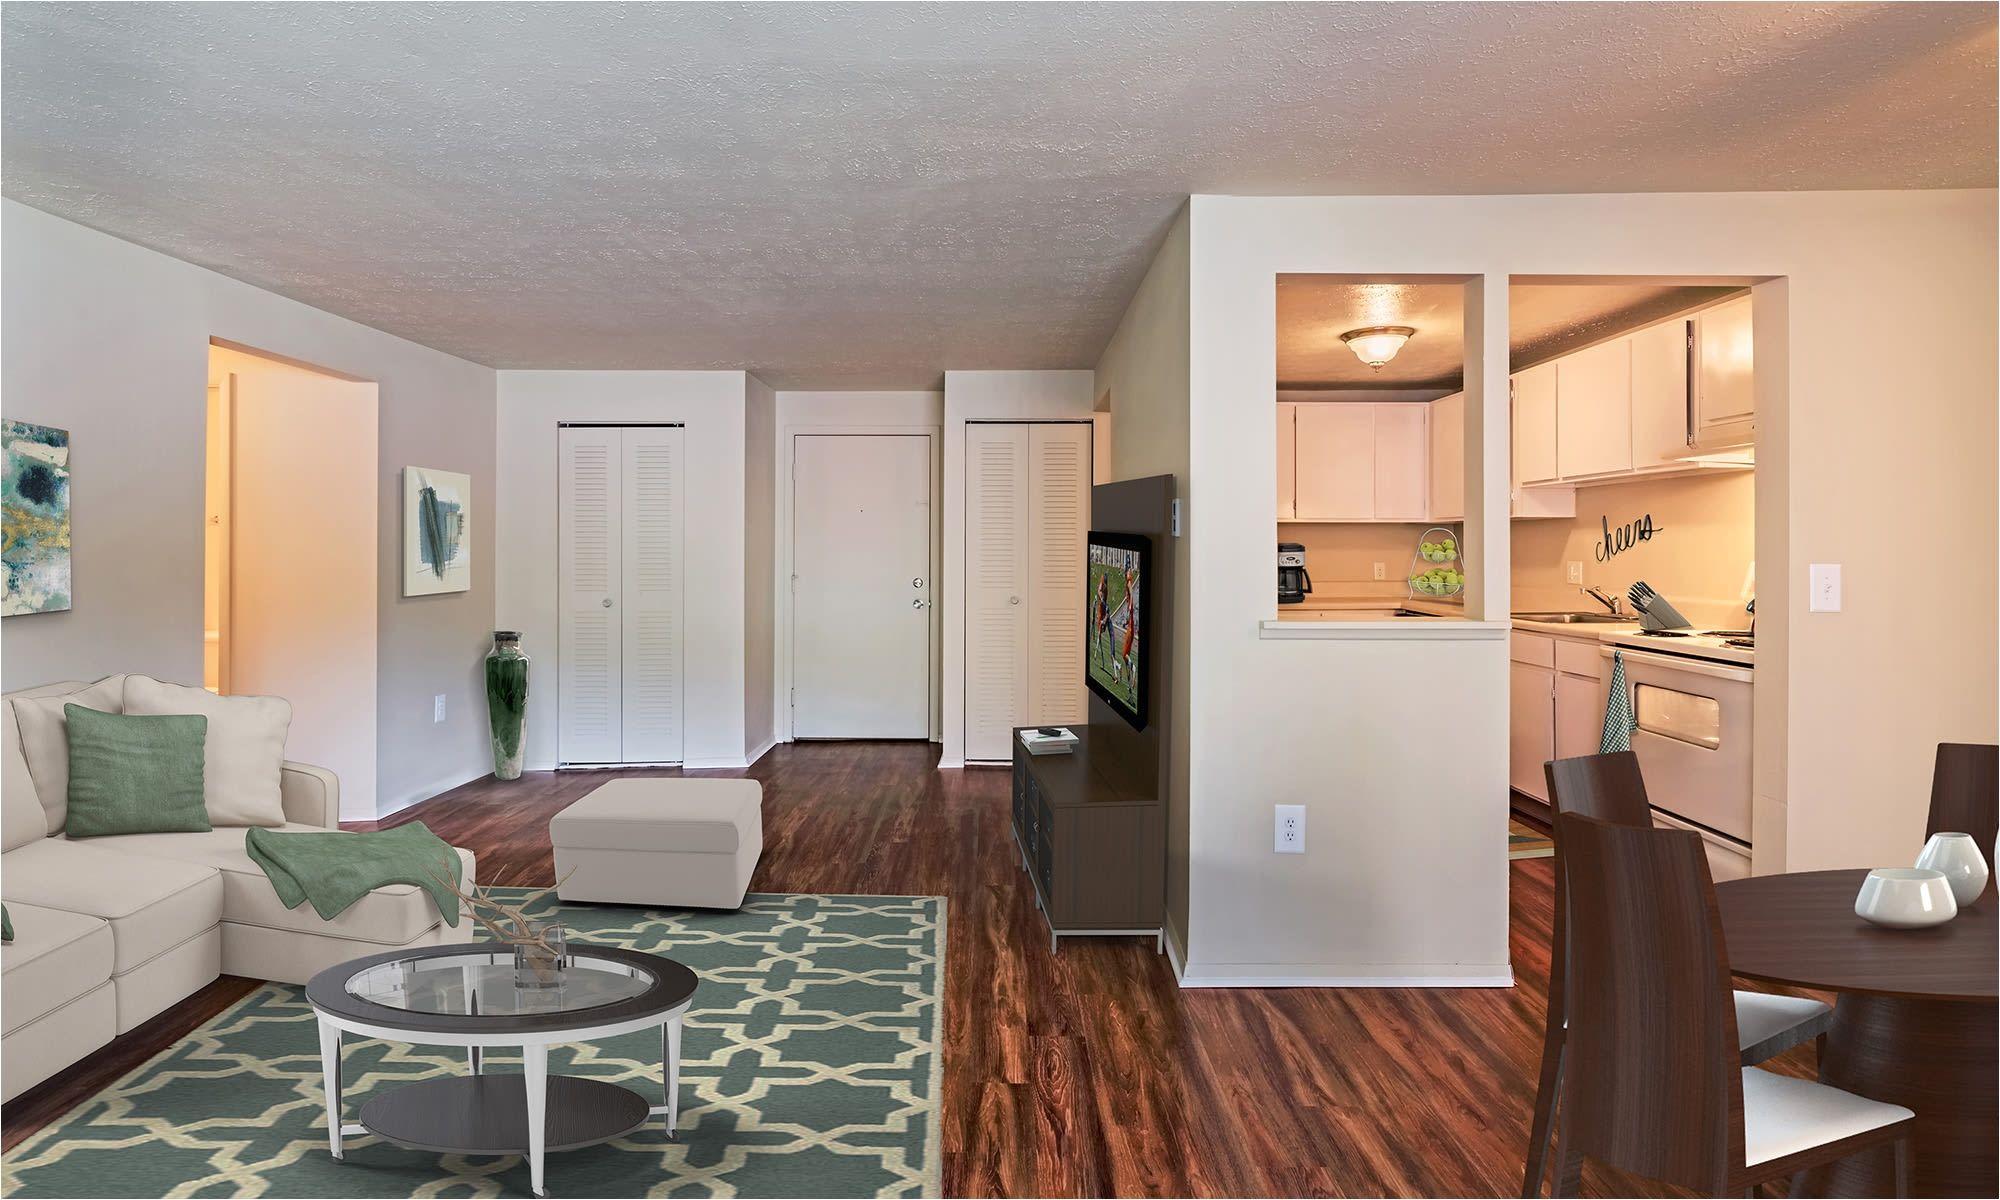 1 Bedroom Apartments South Park Morgantown Wv 1 Bedroom Apartment Apartment Renting A House